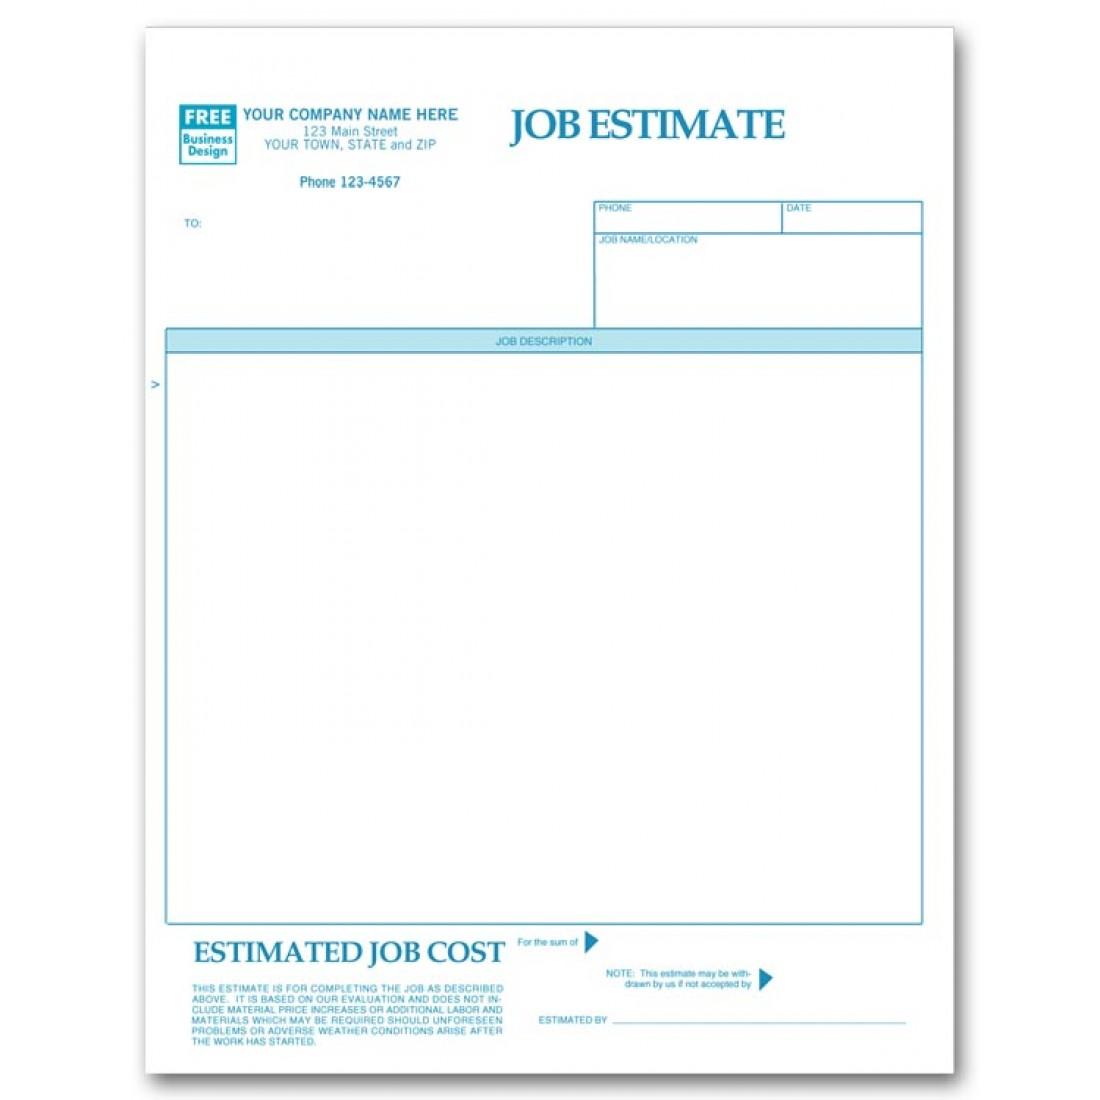 job estimate roy420 tk job estimate 24 04 2017